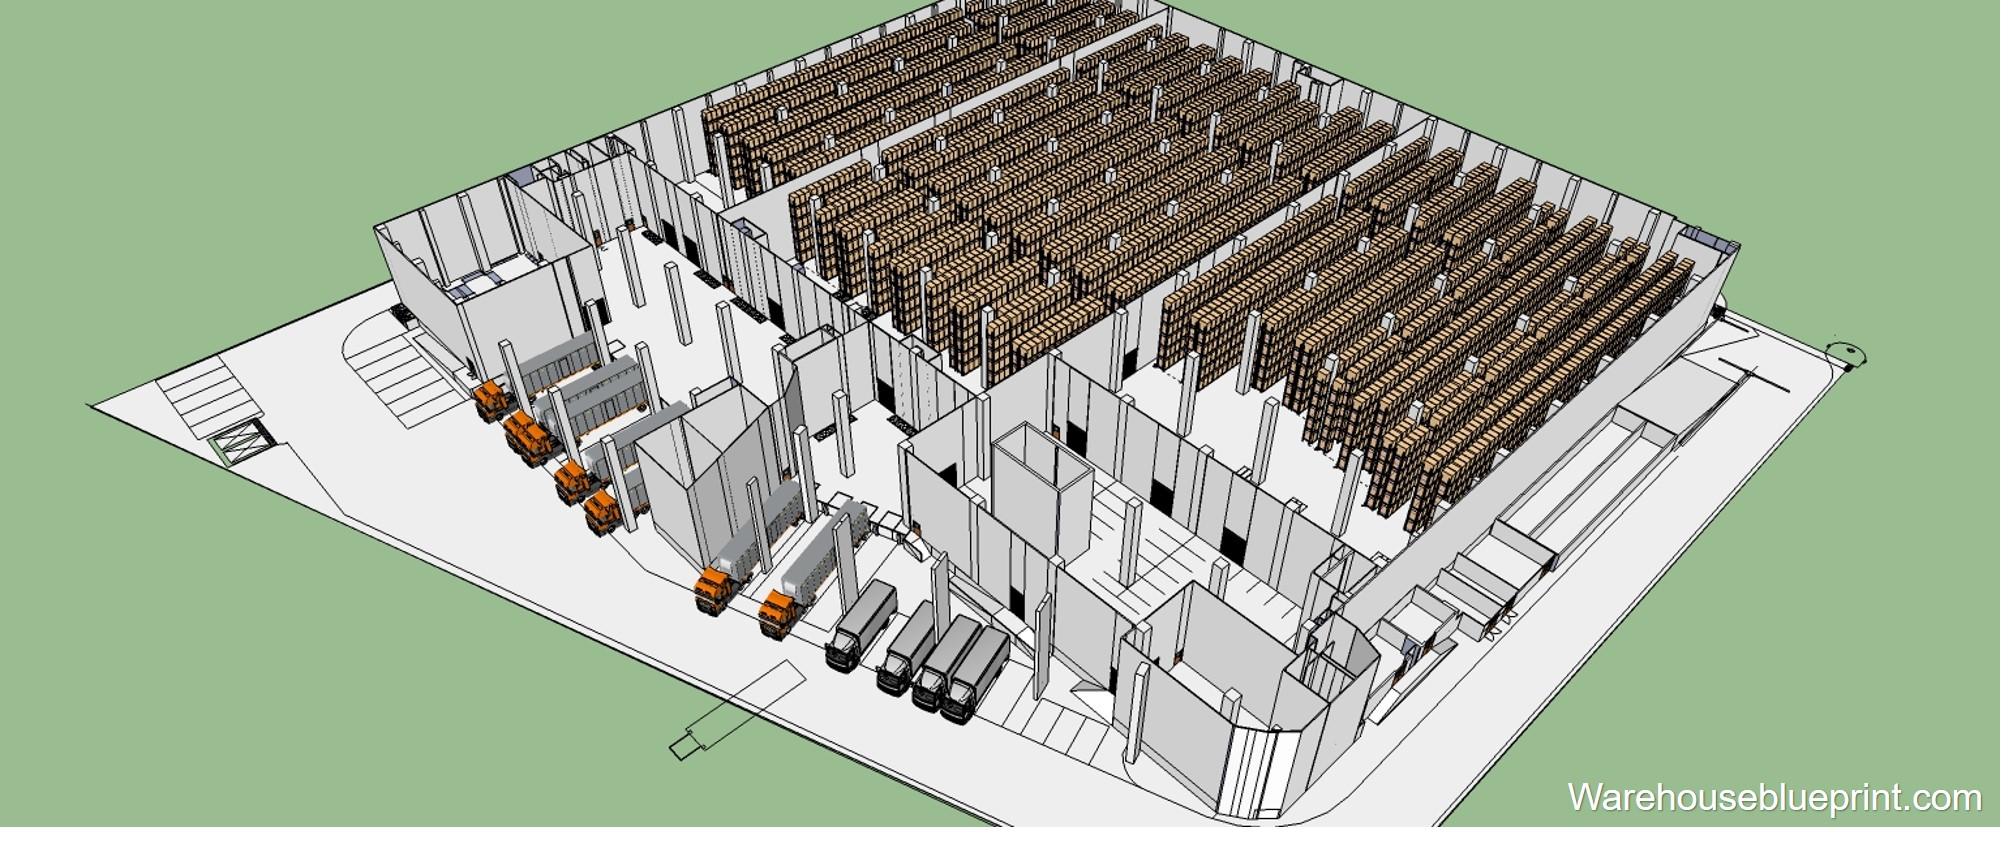 2009x846 Warehouseblueprint Warehouse Visualization Made Simple